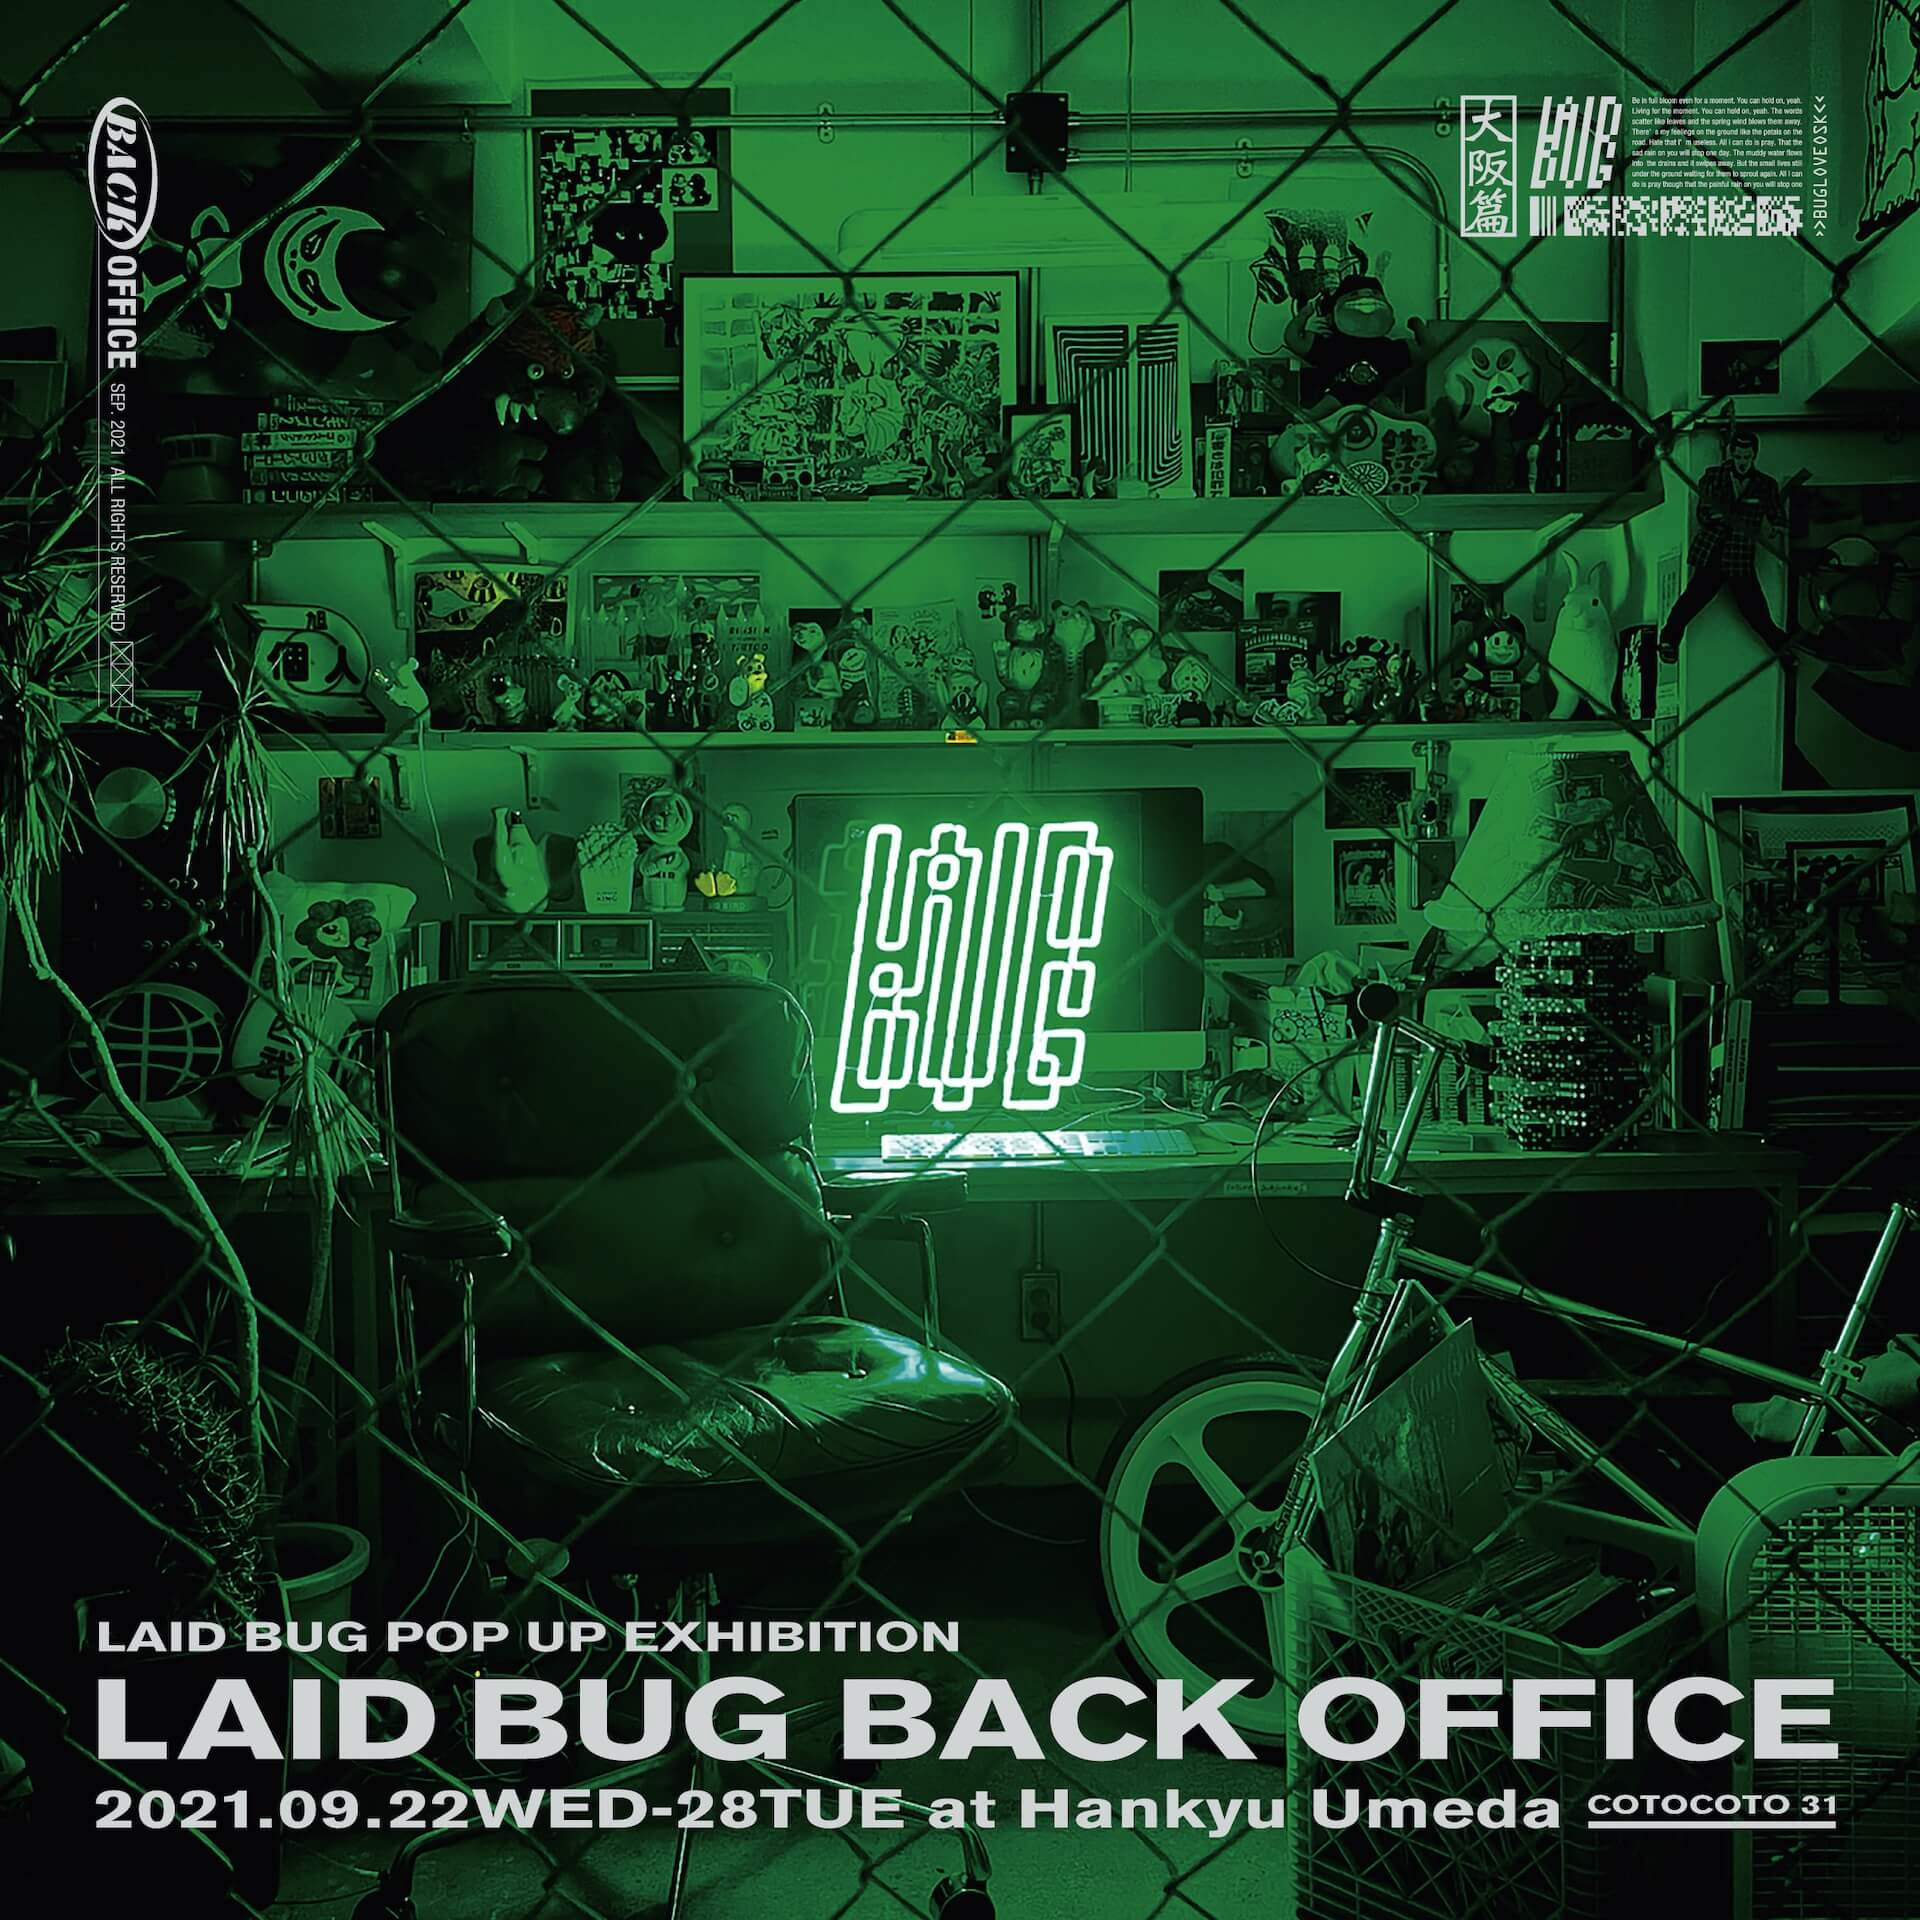 LAID BUGがポップアップエキシビジョン<LAID BUG BACK OFFICE>を開催!寺沢美遊、西雄大らが作品を出展 art210917_laidbug_01